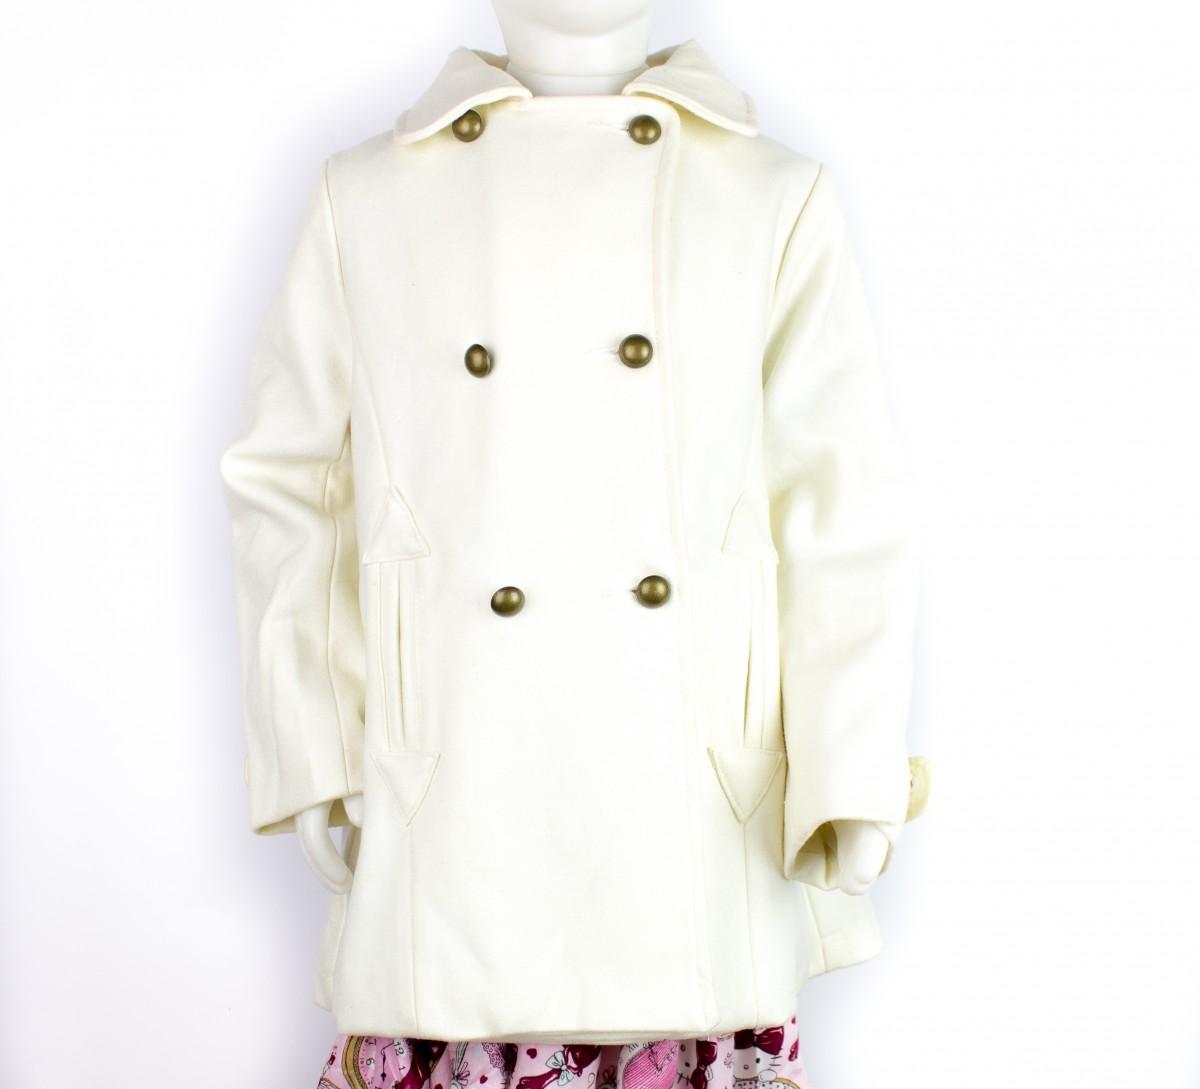 99d10fd75 Bizz Store - Casaco de Lã Infantil Feminino Tip Top Branco Neve